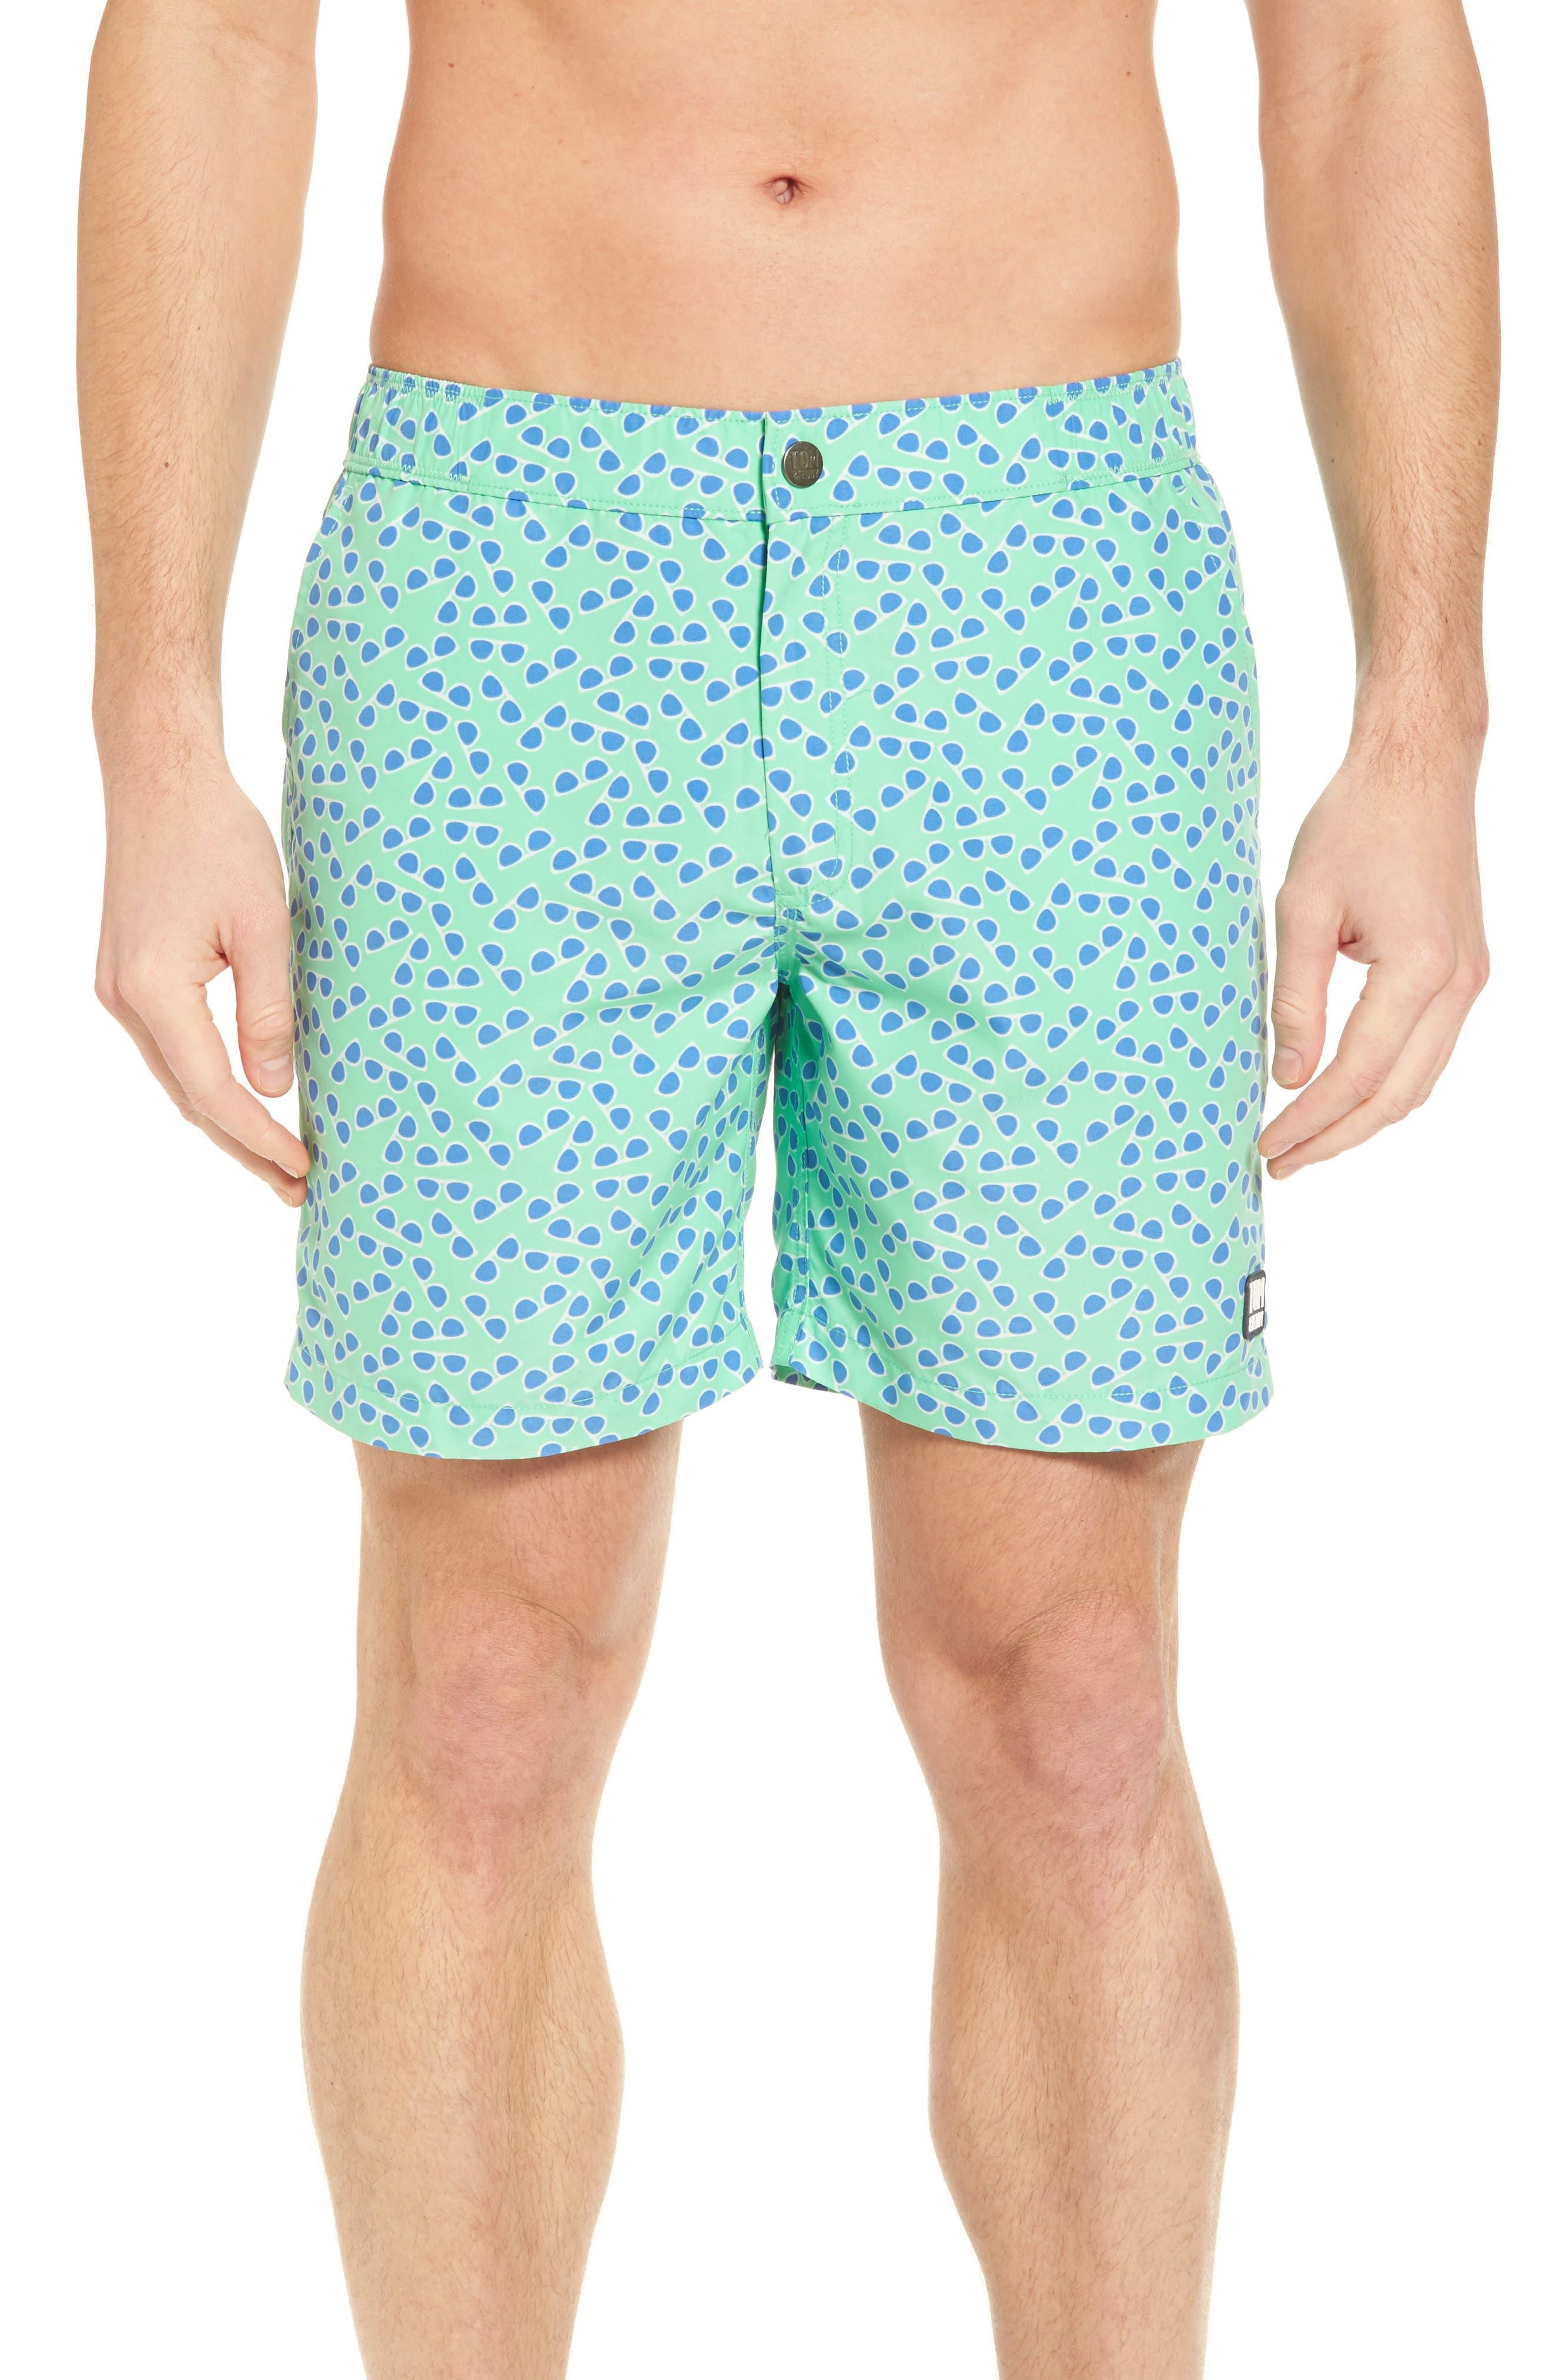 TOM & TEDDY Sunglasses Print Swim Trunks in Spring Green